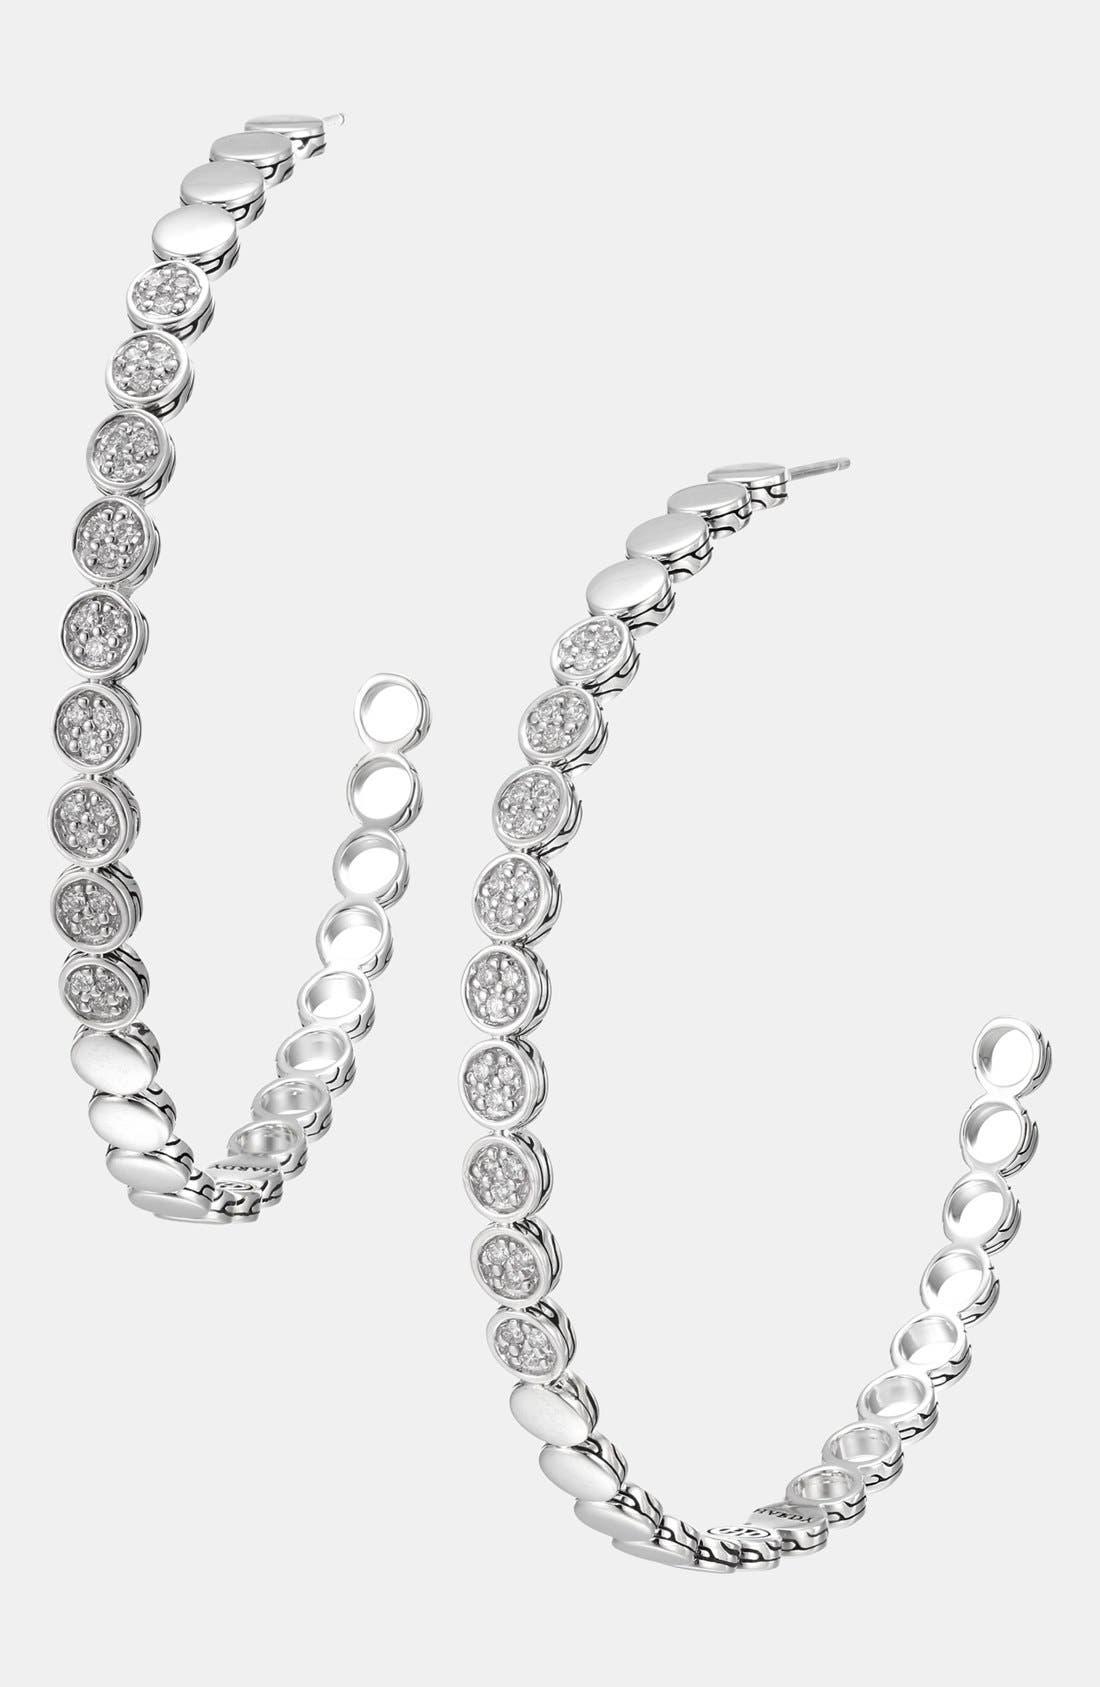 Alternate Image 1 Selected - John Hardy 'Dot' Extra Large Pavé Diamond Hoop Earrings